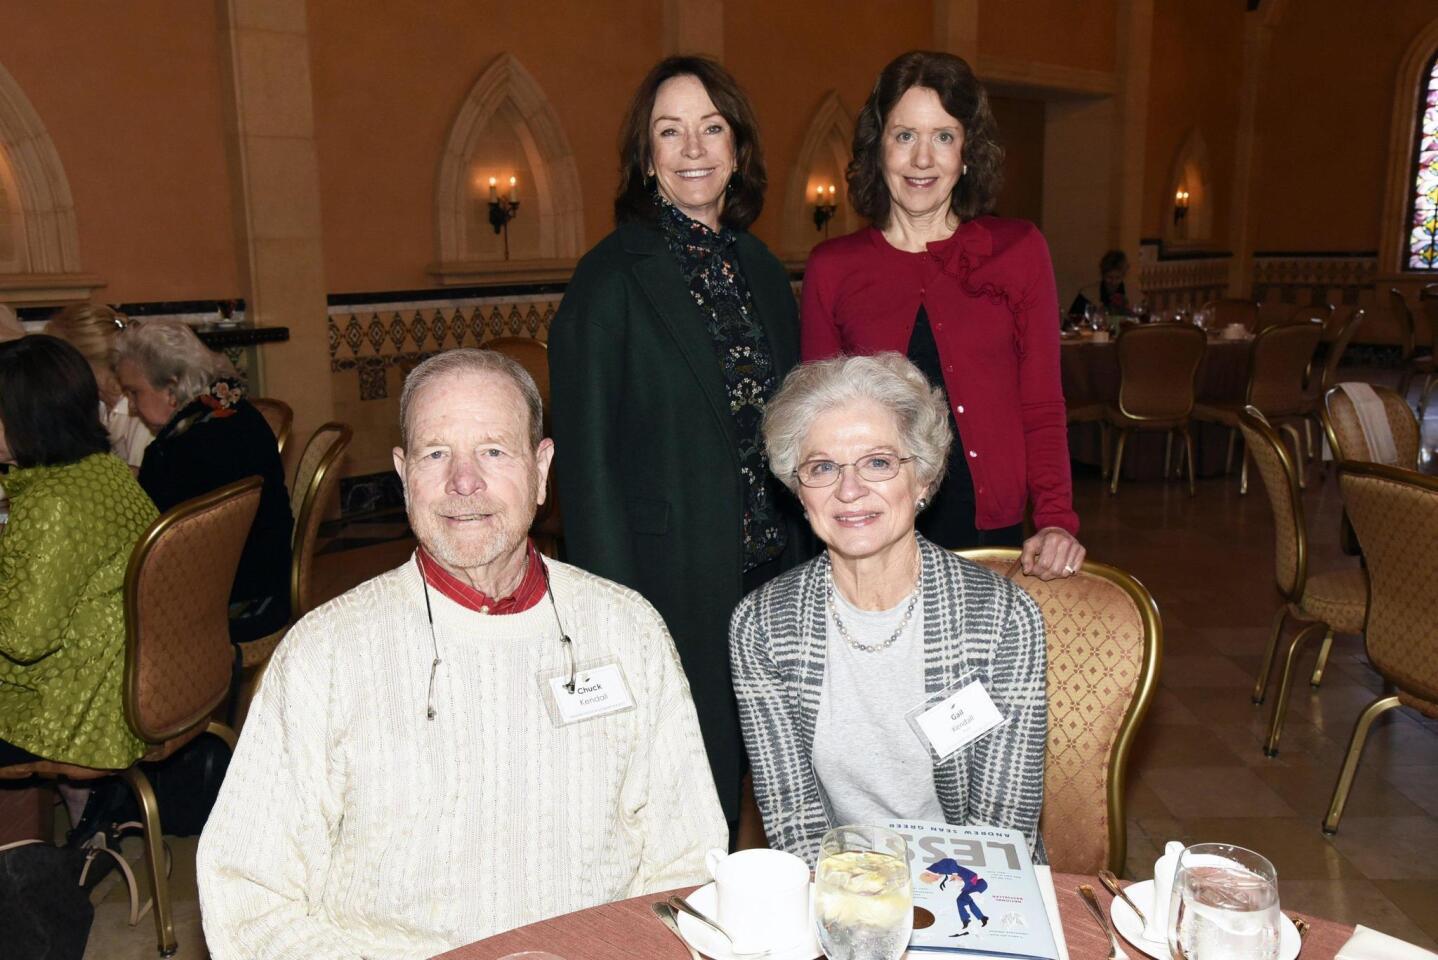 Susan Nettinga, Kathy Henry, Chuck and Gail Kendall (seated)